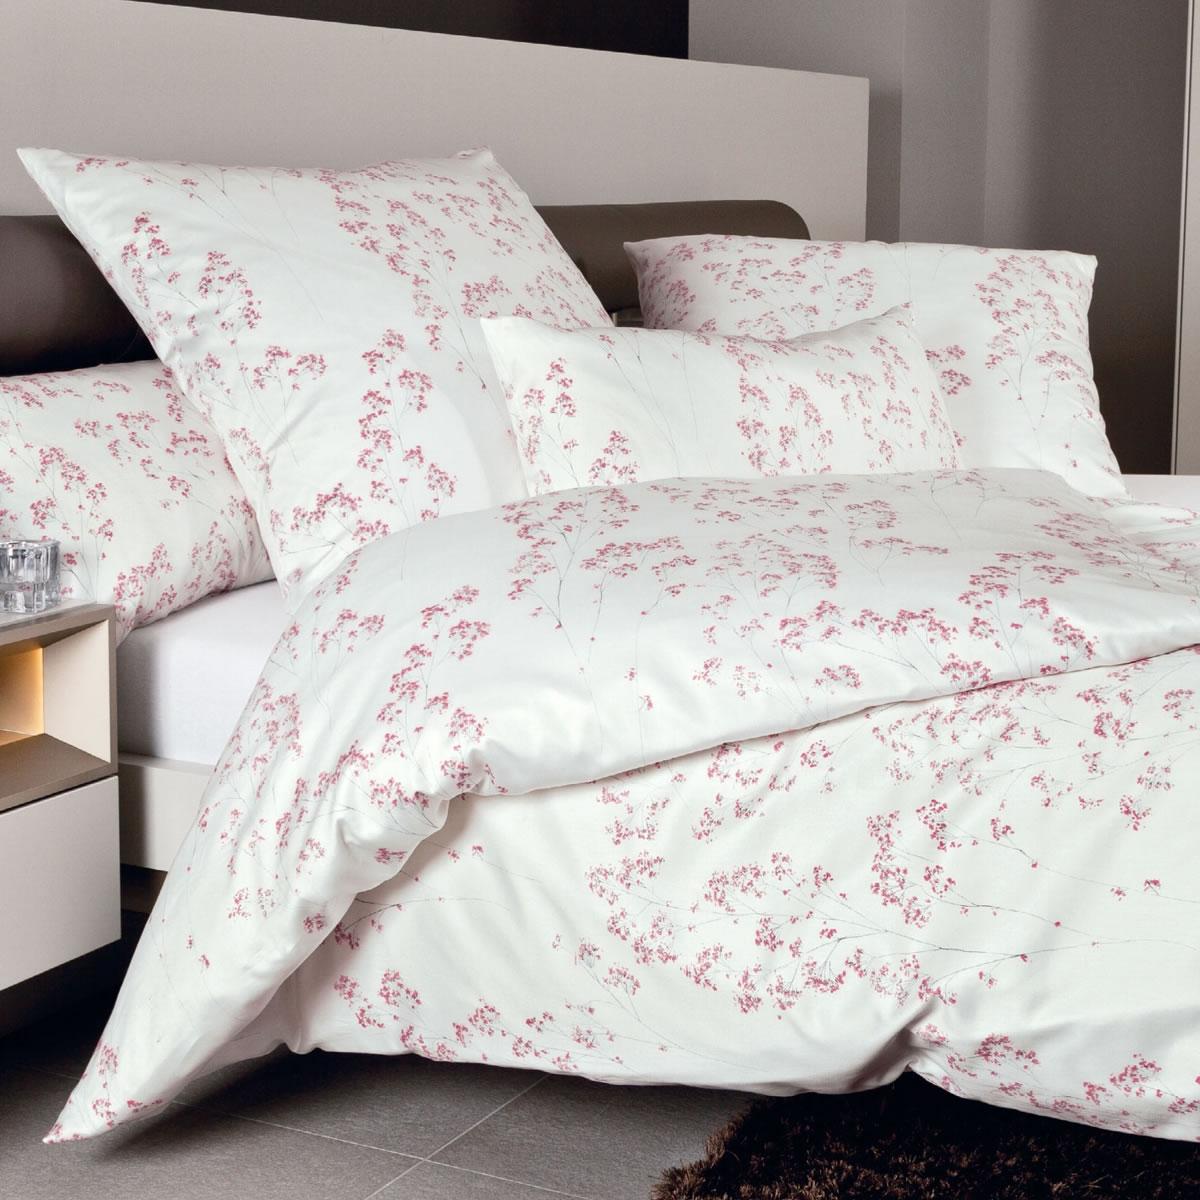 erzstef bettdecken lattenroste 80x200 gebraucht schlafzimmer wandfarbe wei e m bel biber. Black Bedroom Furniture Sets. Home Design Ideas